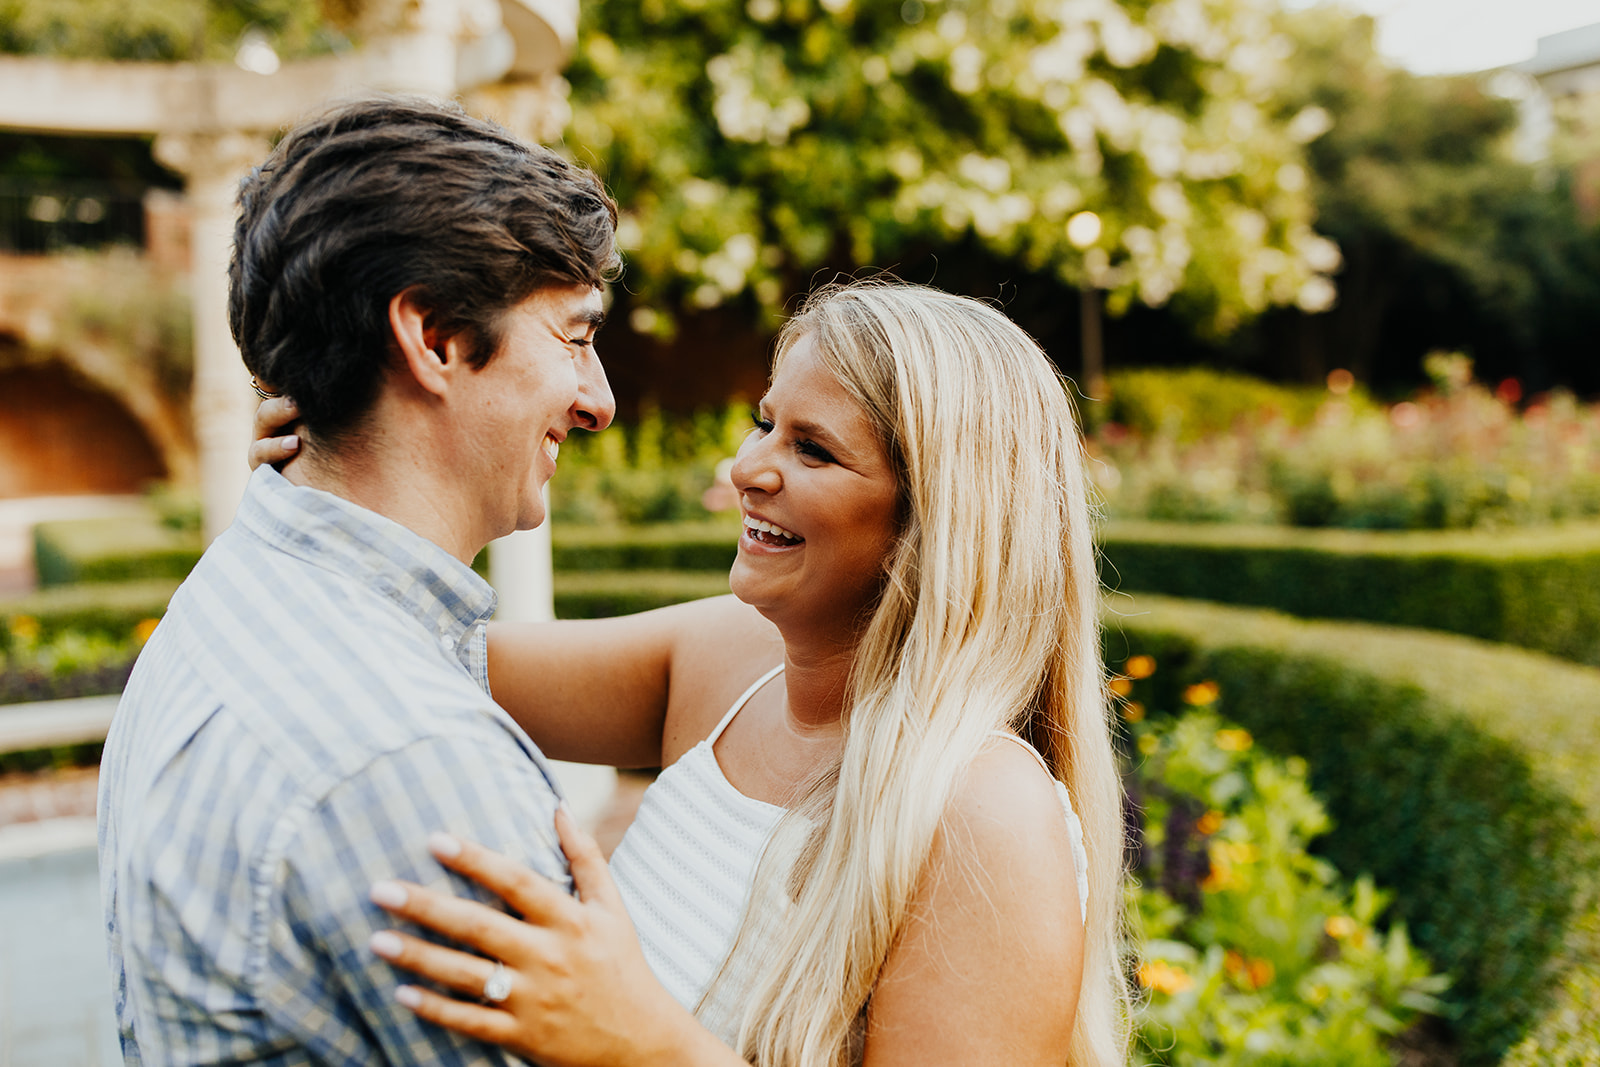 Taylor_Patrick_Engagement-56.jpg